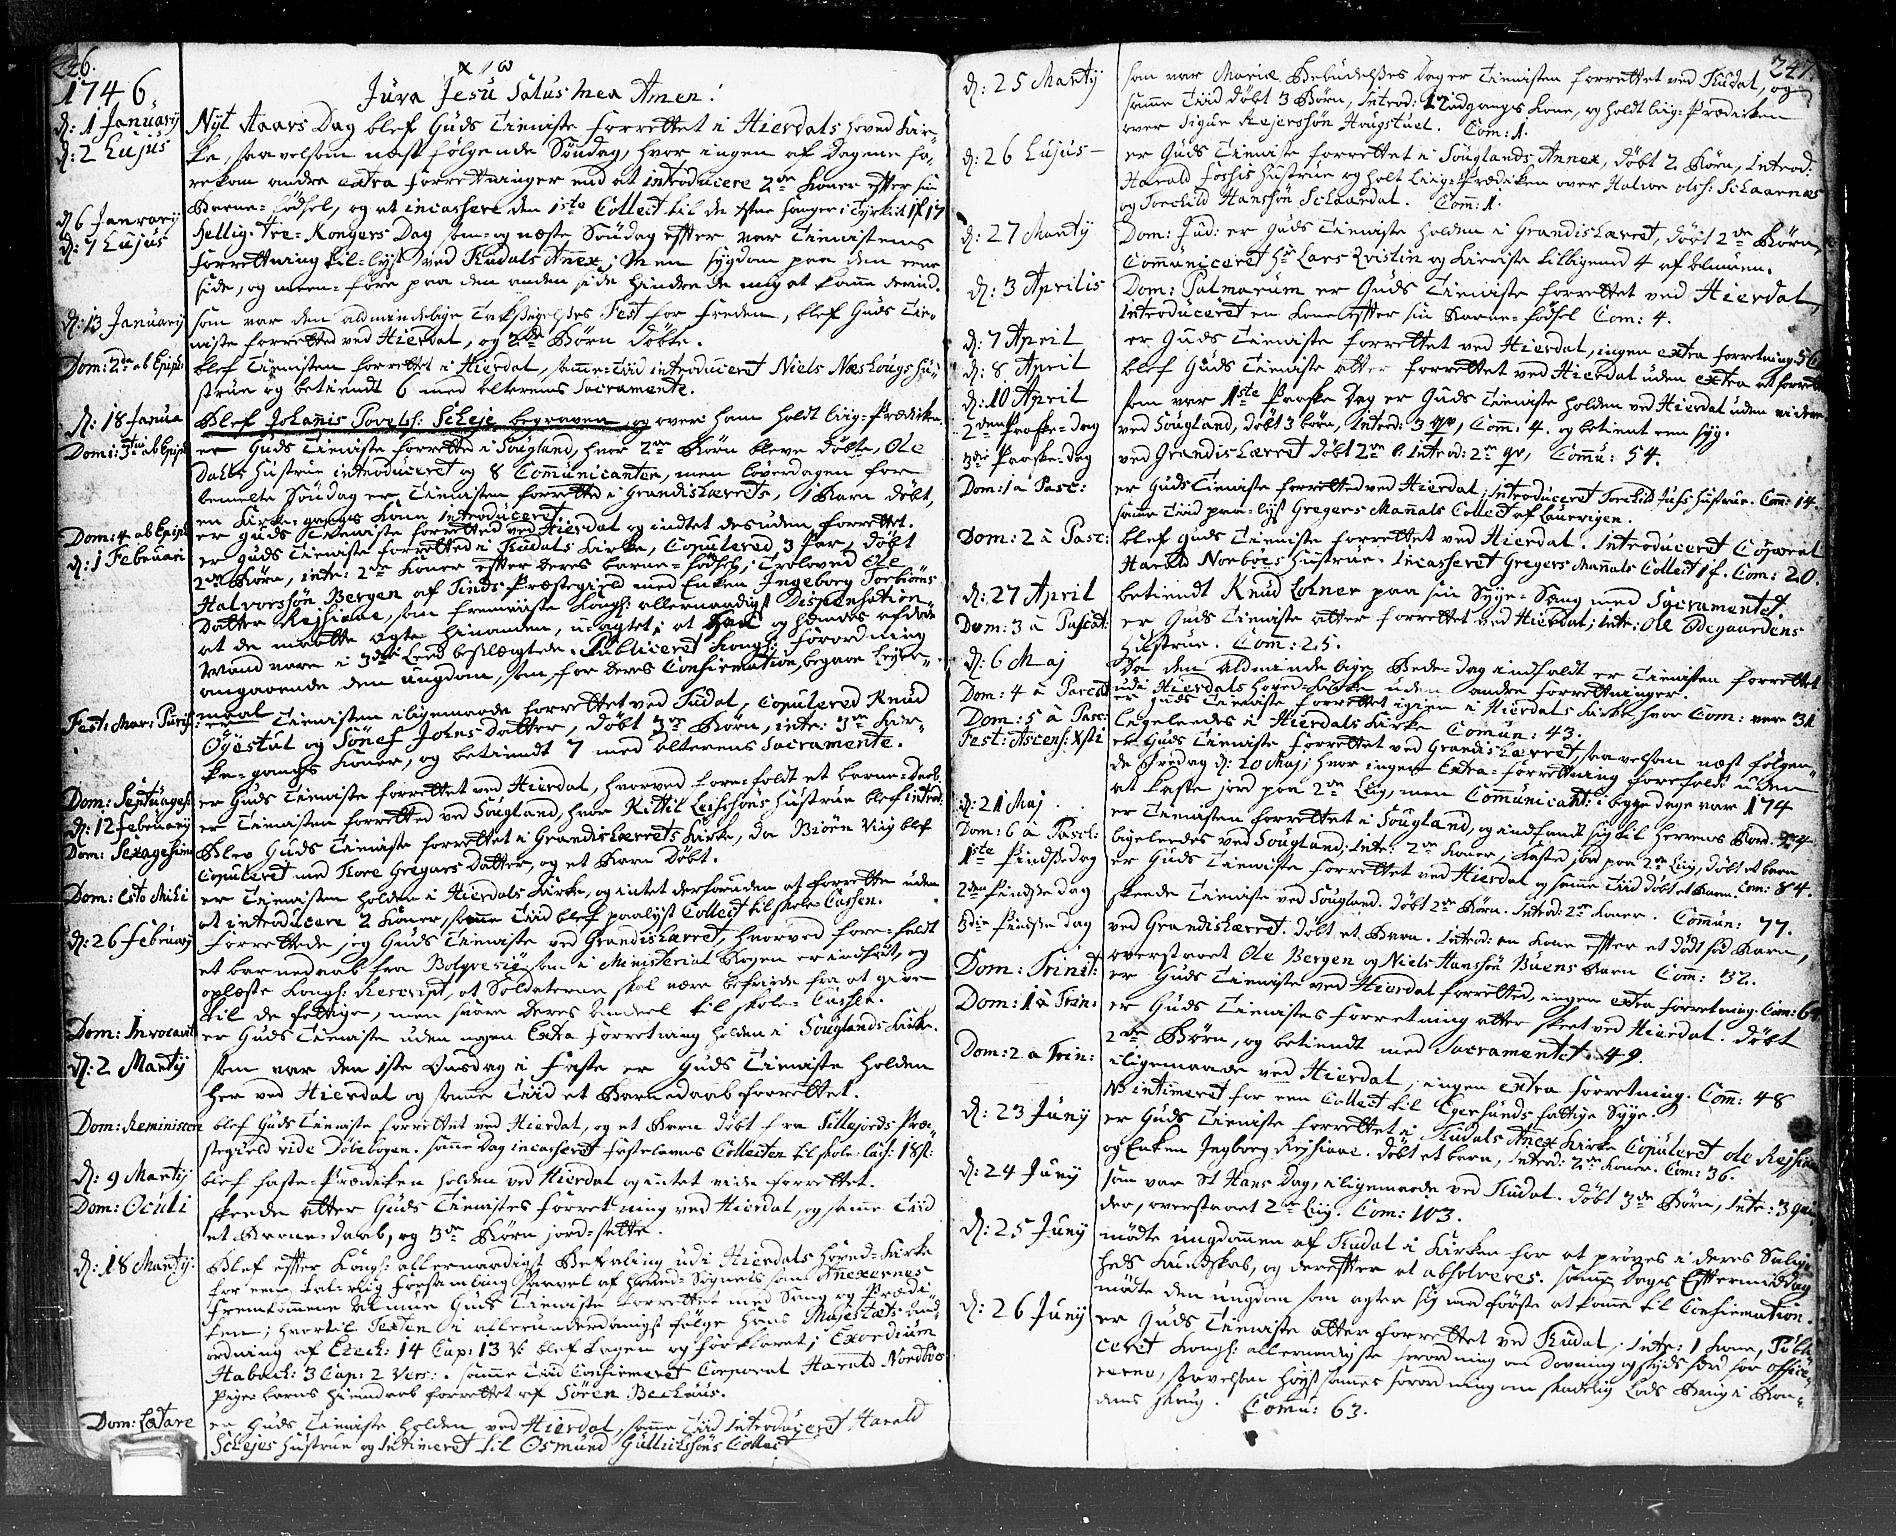 SAKO, Hjartdal kirkebøker, F/Fa/L0002: Ministerialbok nr. I 2, 1716-1754, s. 246-247